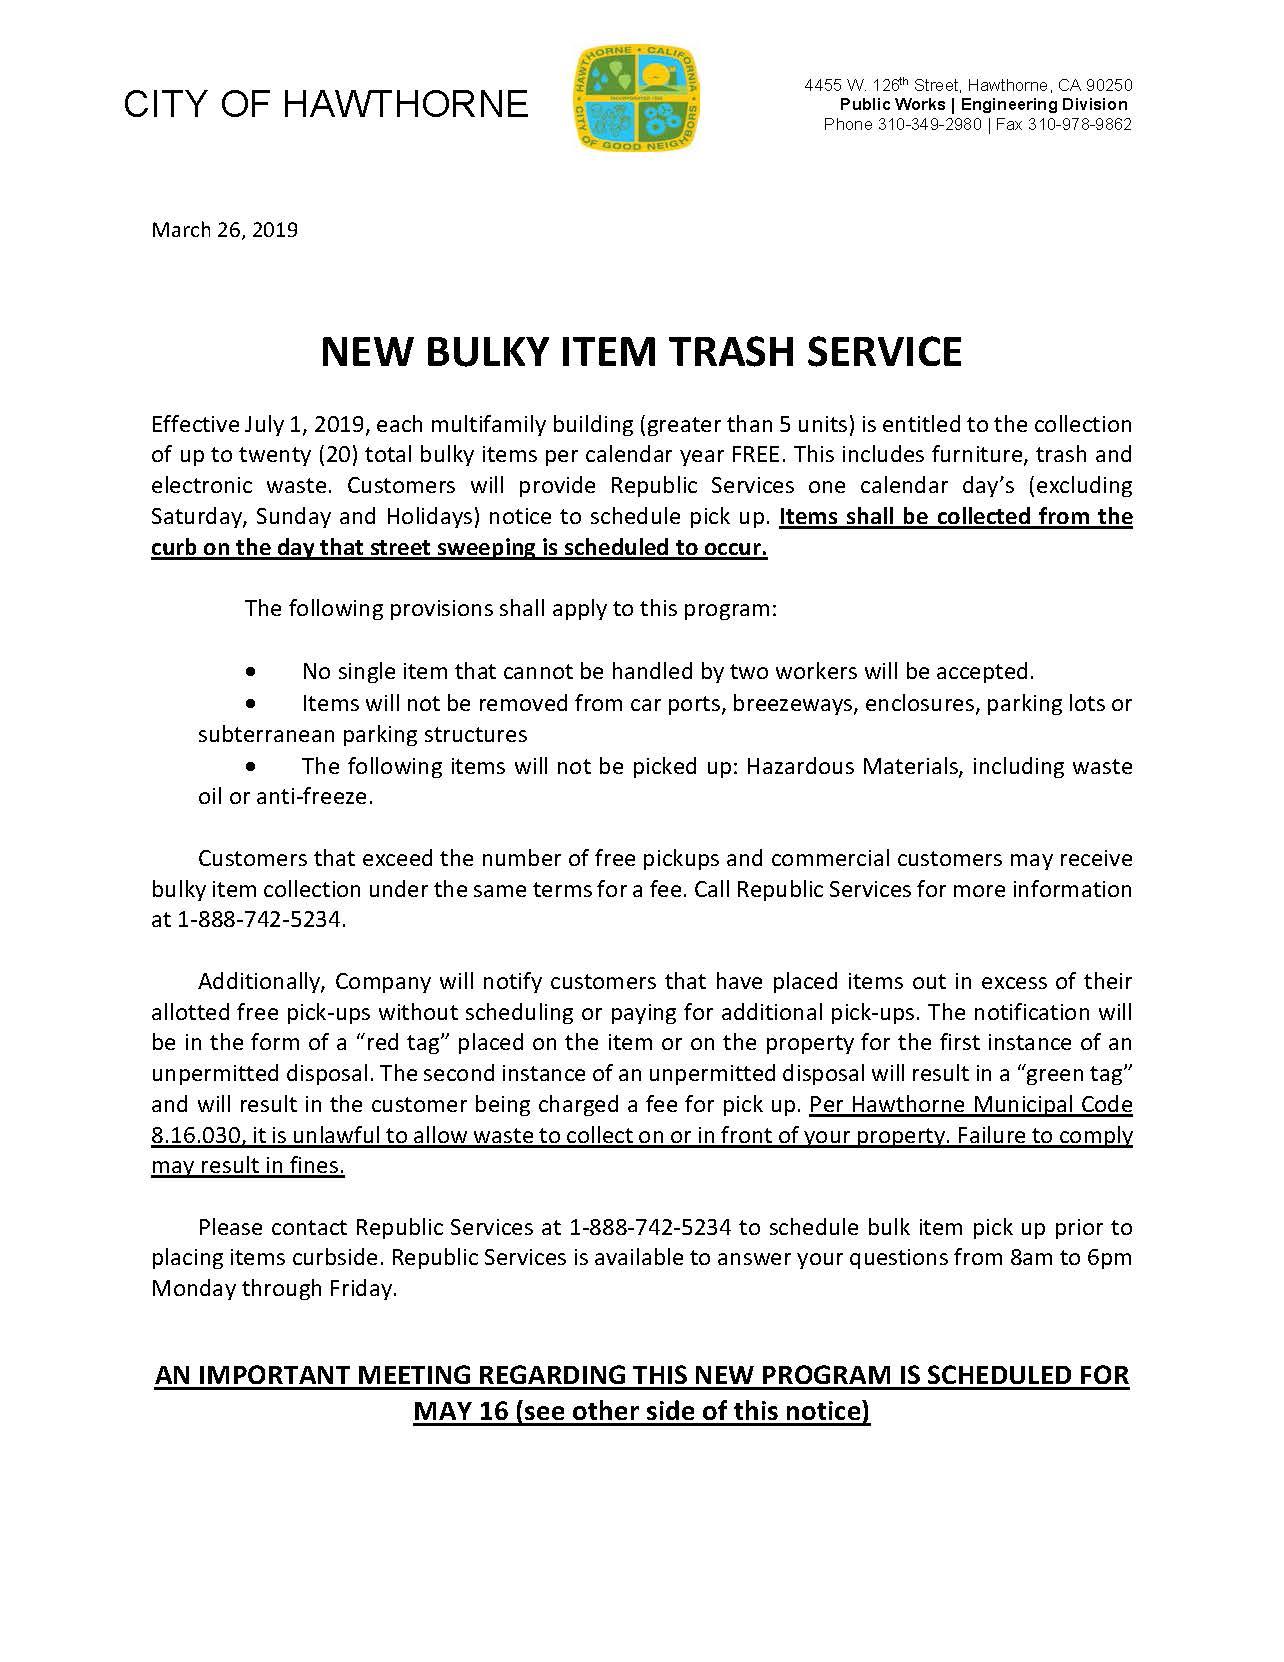 New Bulky Item Trash Service